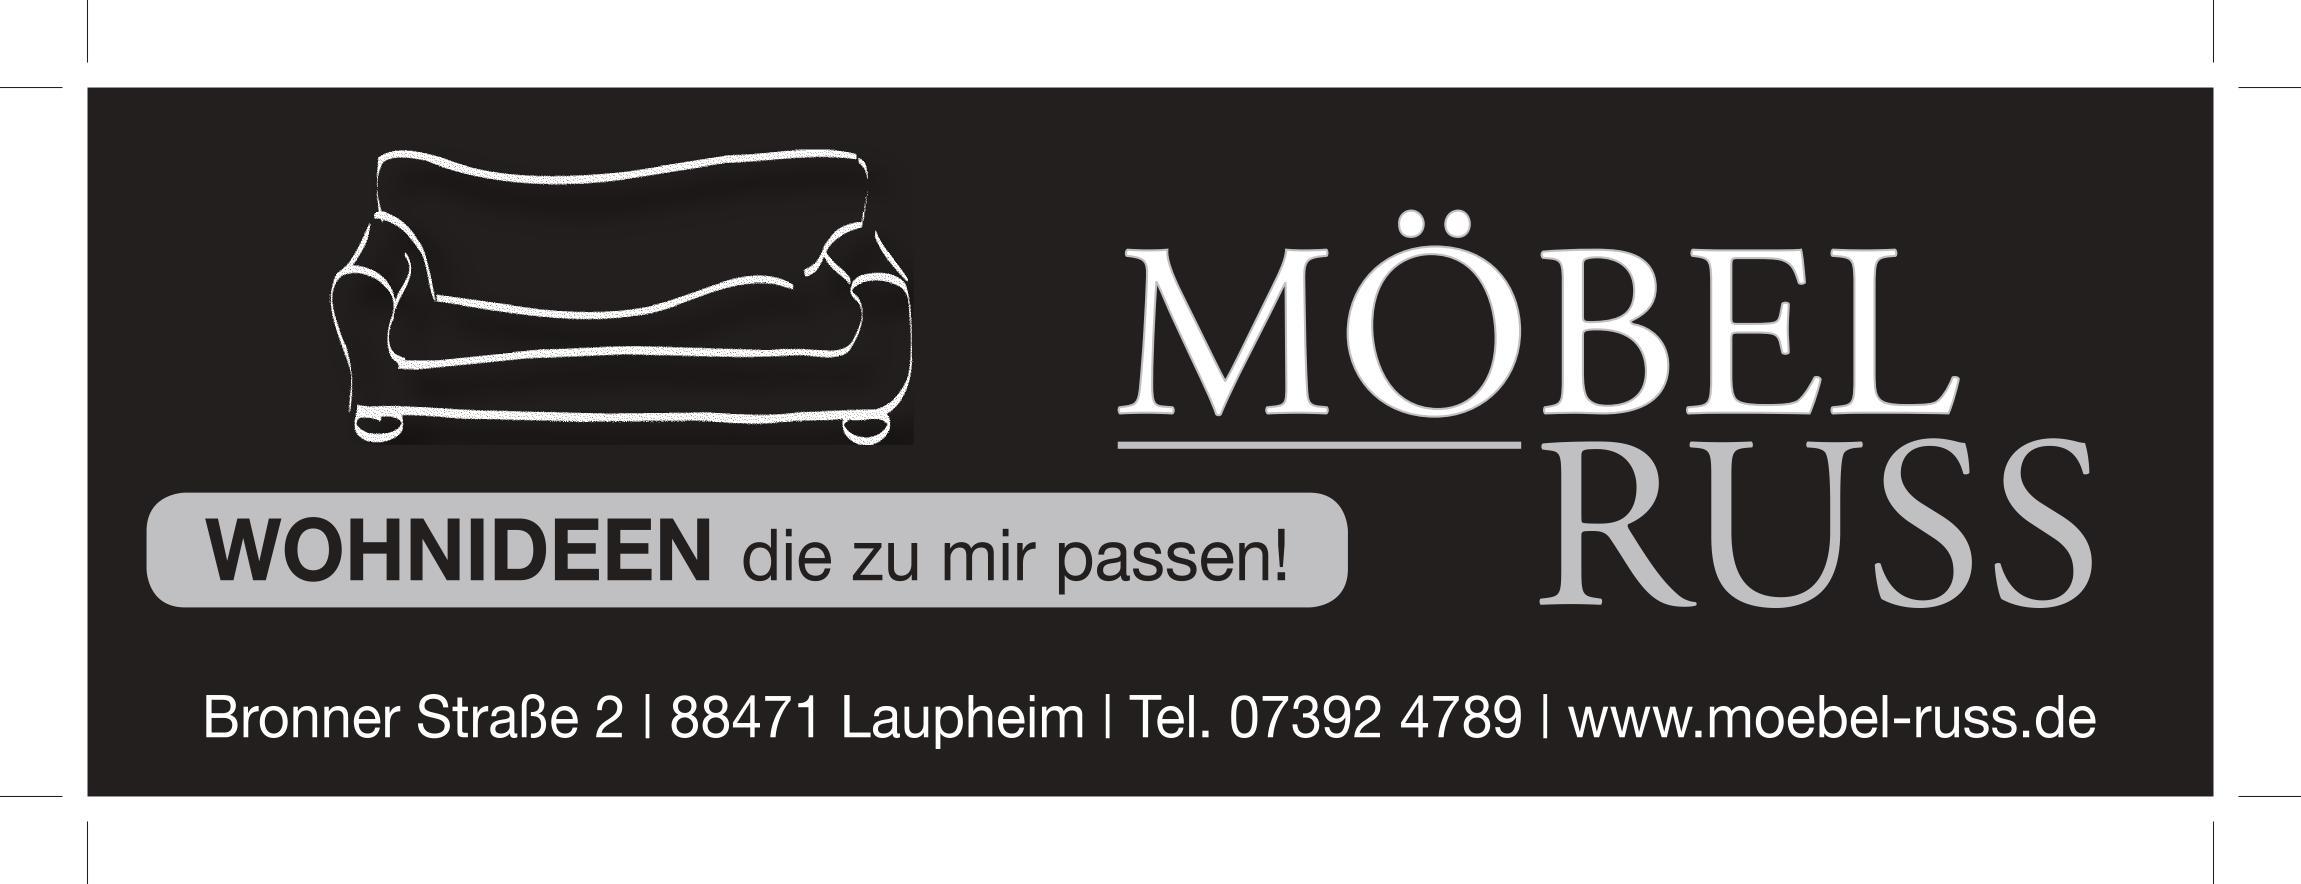 moebel-russ-laupheim logo